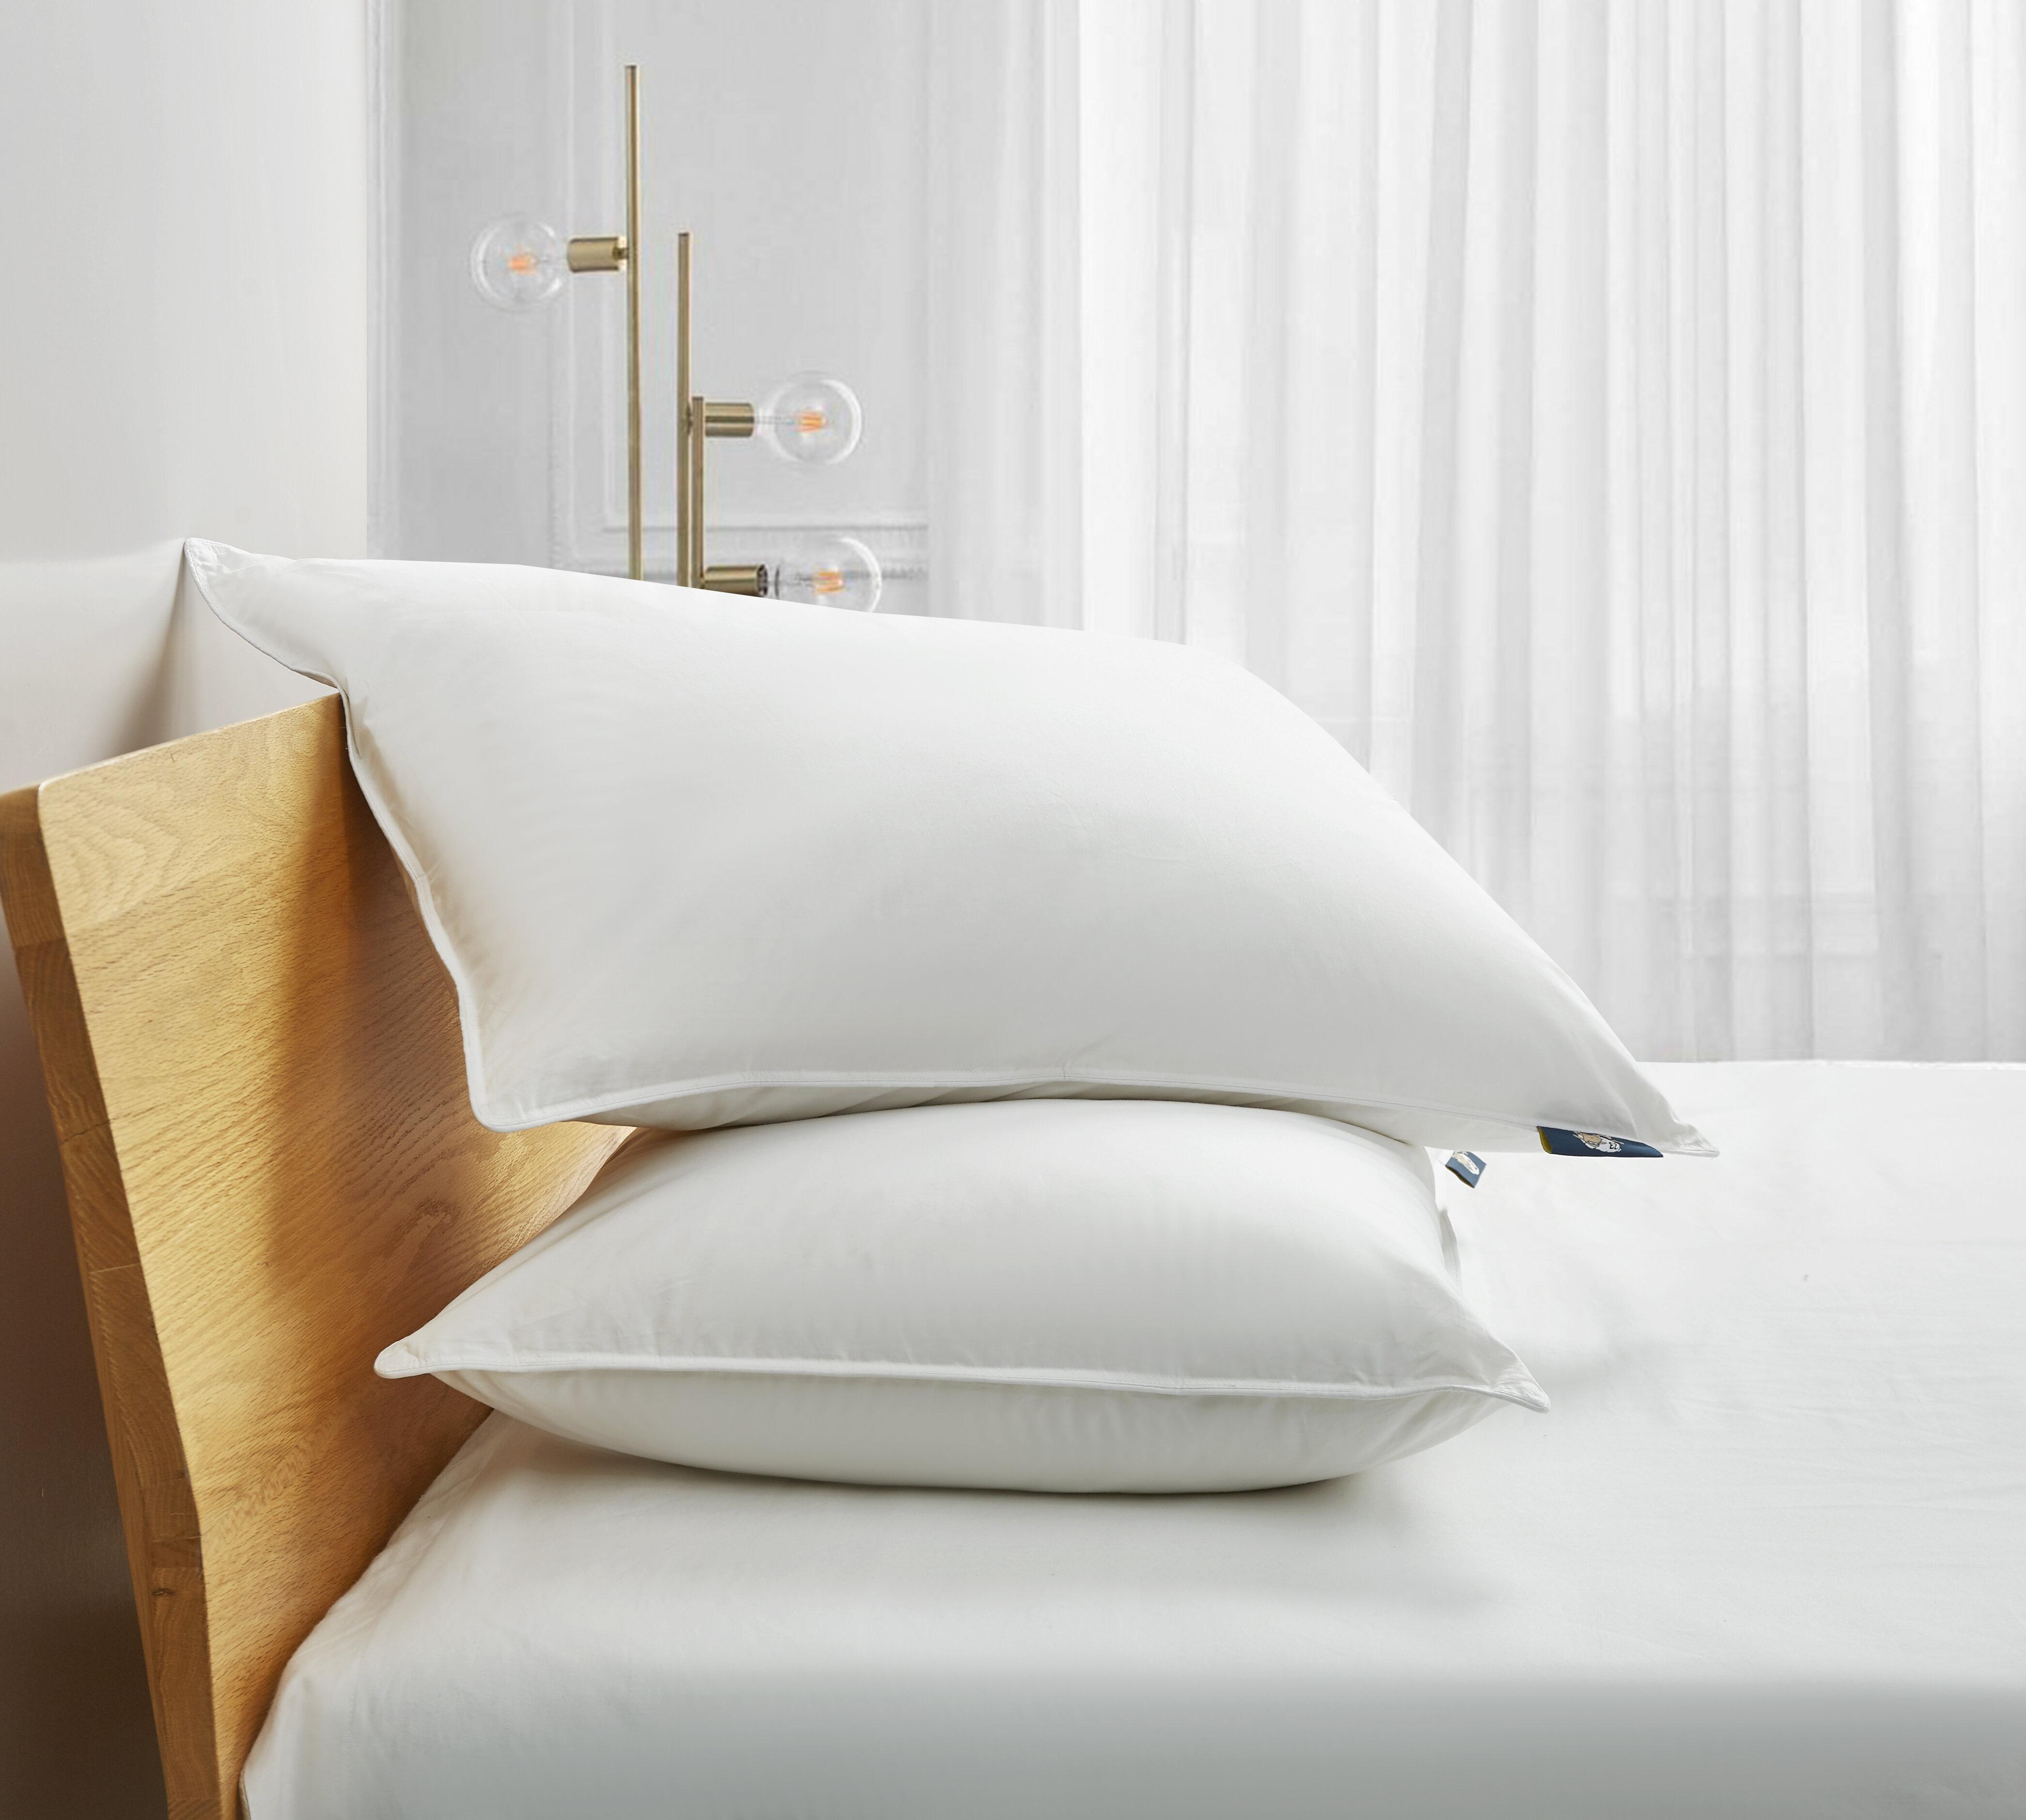 Bed Pillow Perfect Sleeper Serta Queen Hypoallergenic 100/% Cotton 2 PACK